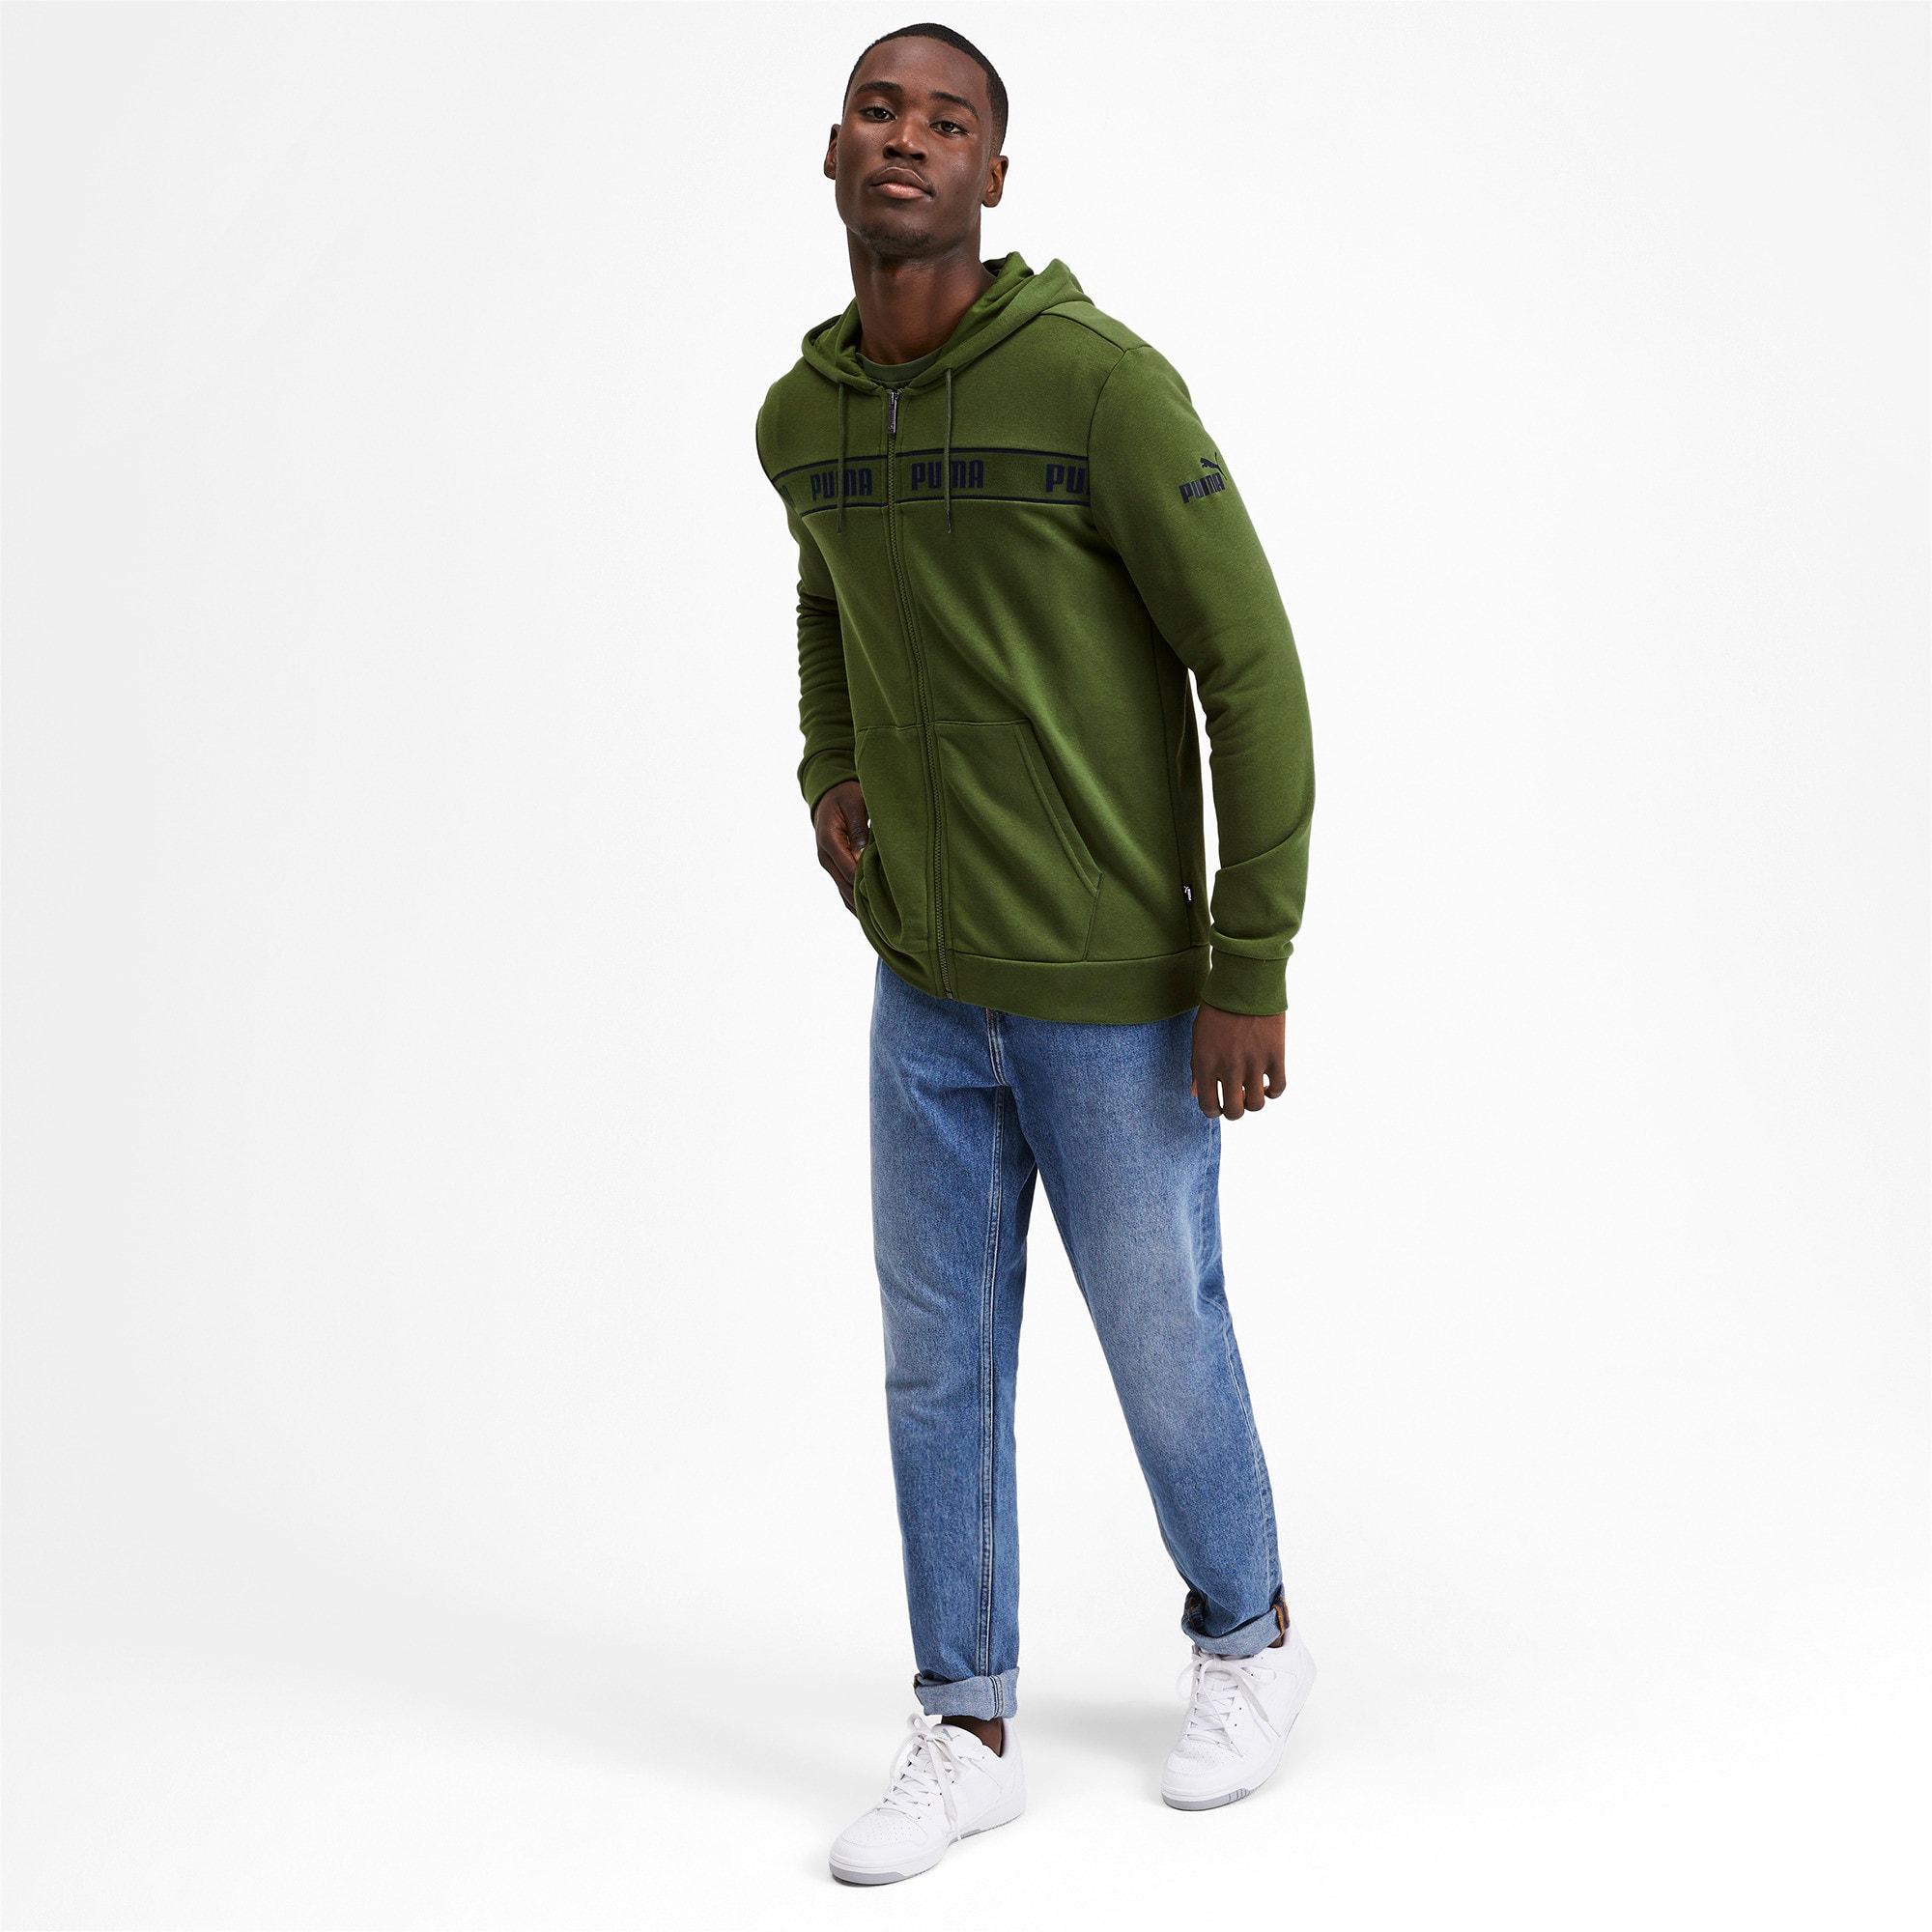 Miniatura 4 de Chaqueta con capucha Amplified para hombre, Garden Green, mediano